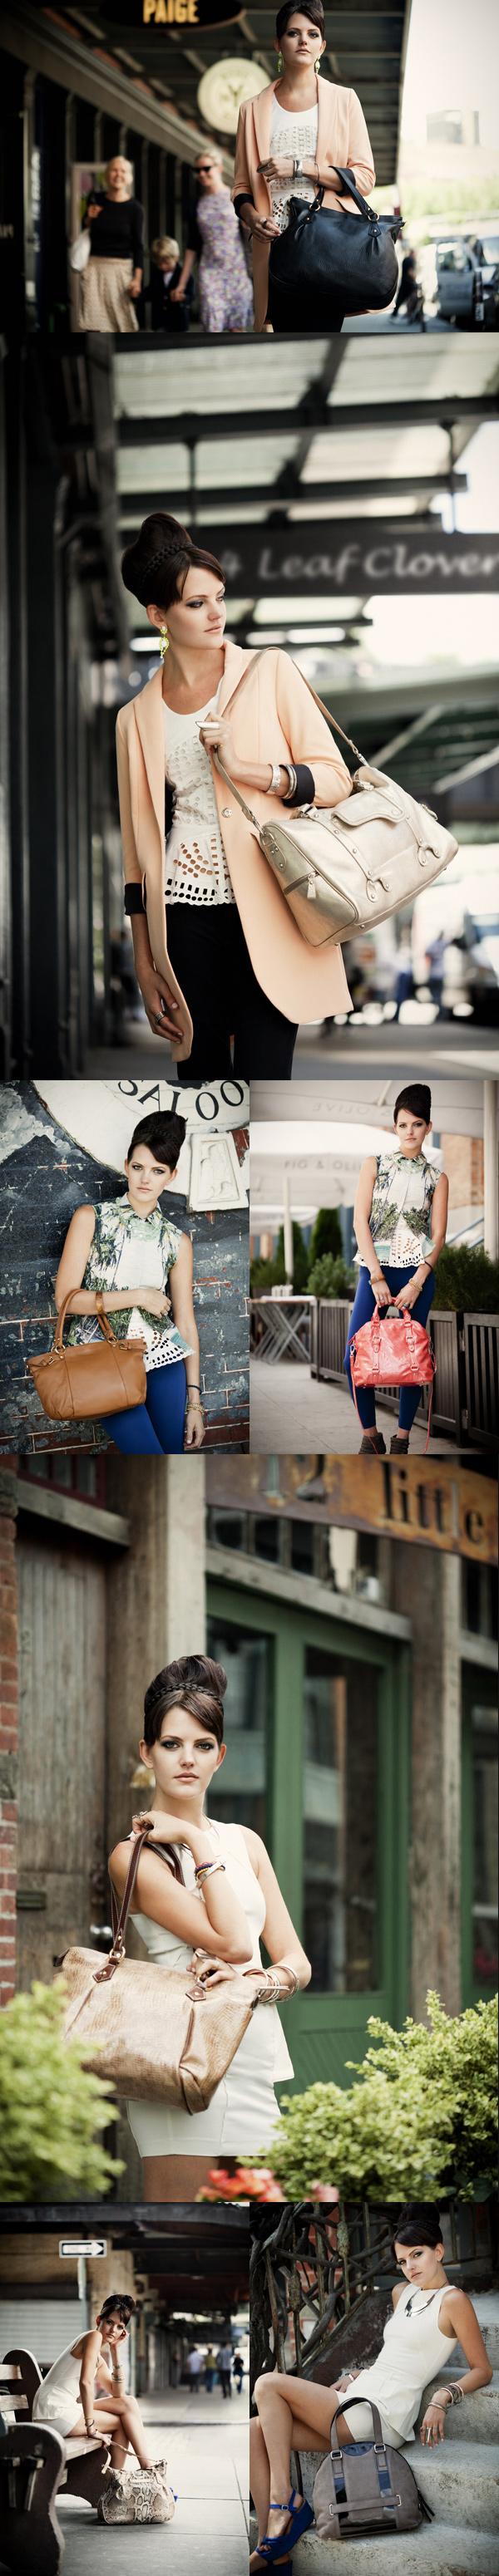 May 21, 2013 4 Leaf Clover handbags